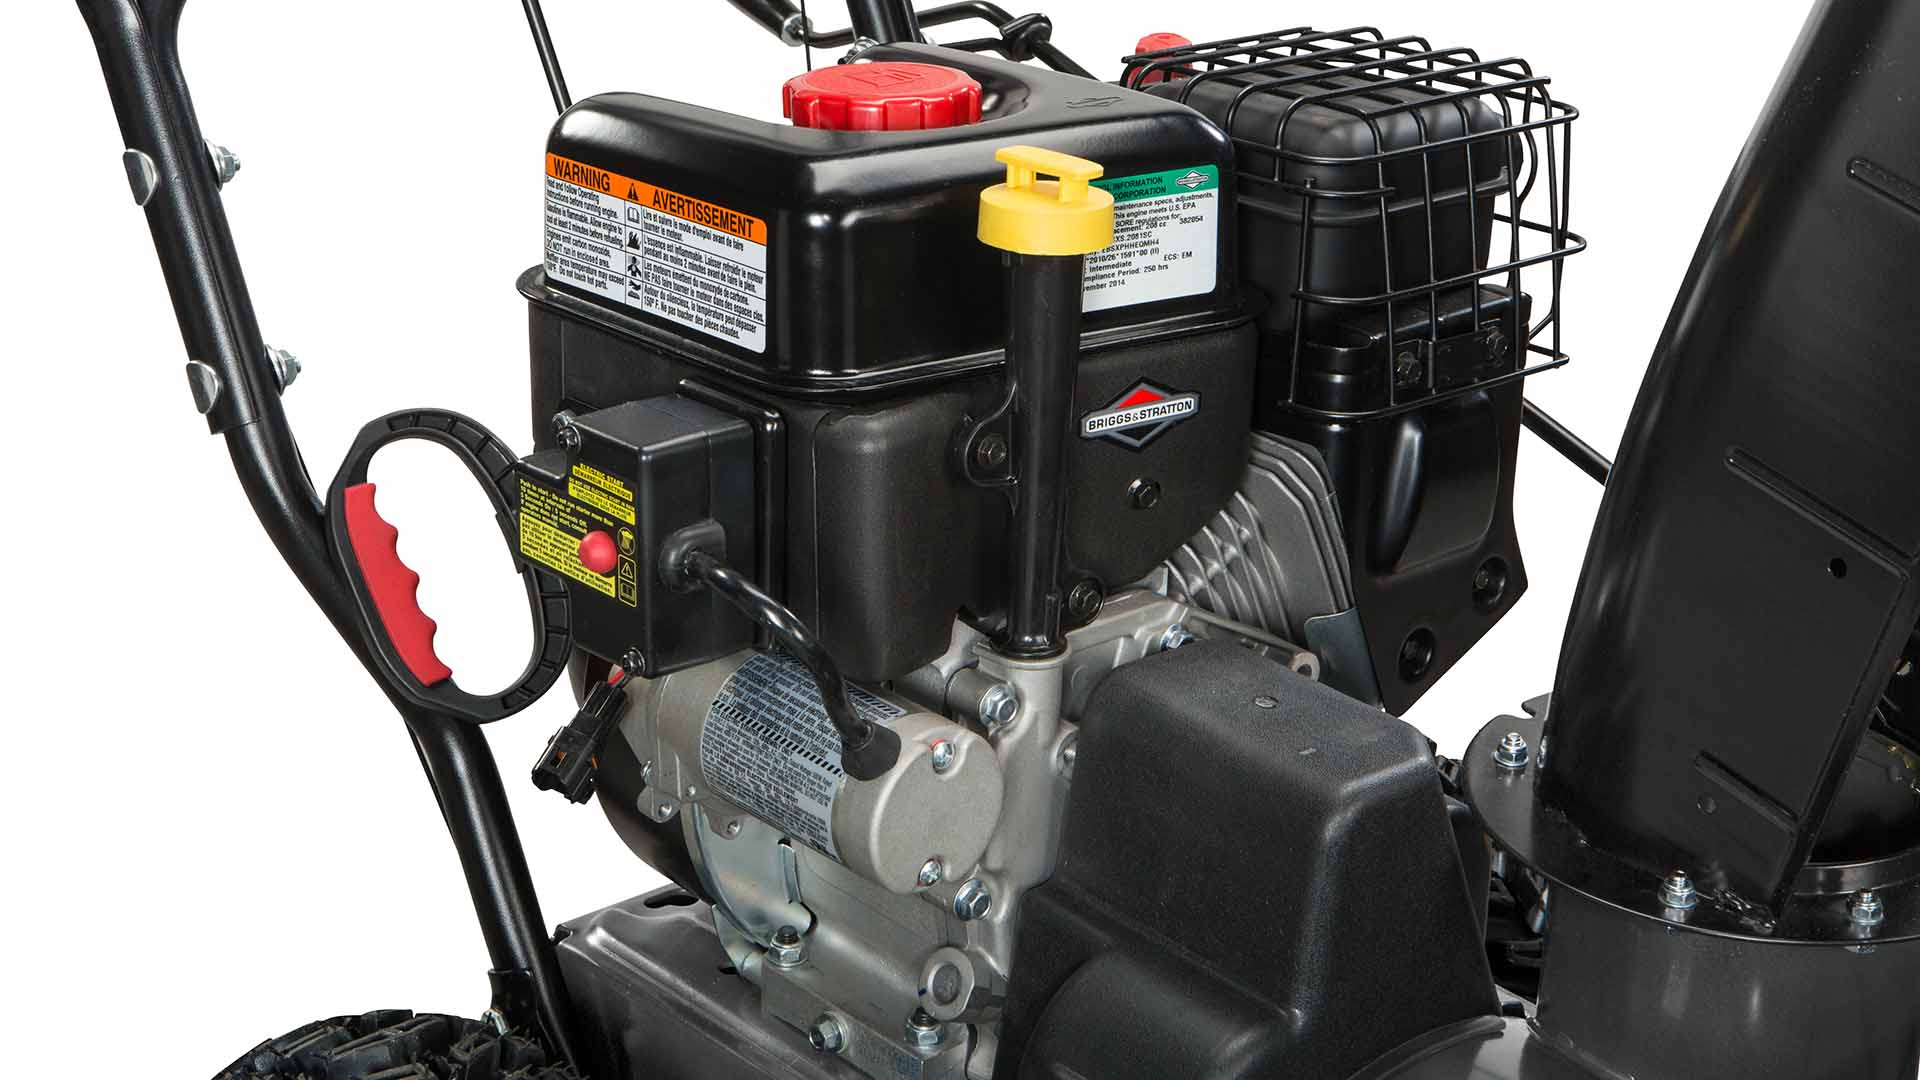 briggs and stratton 950 engine manual